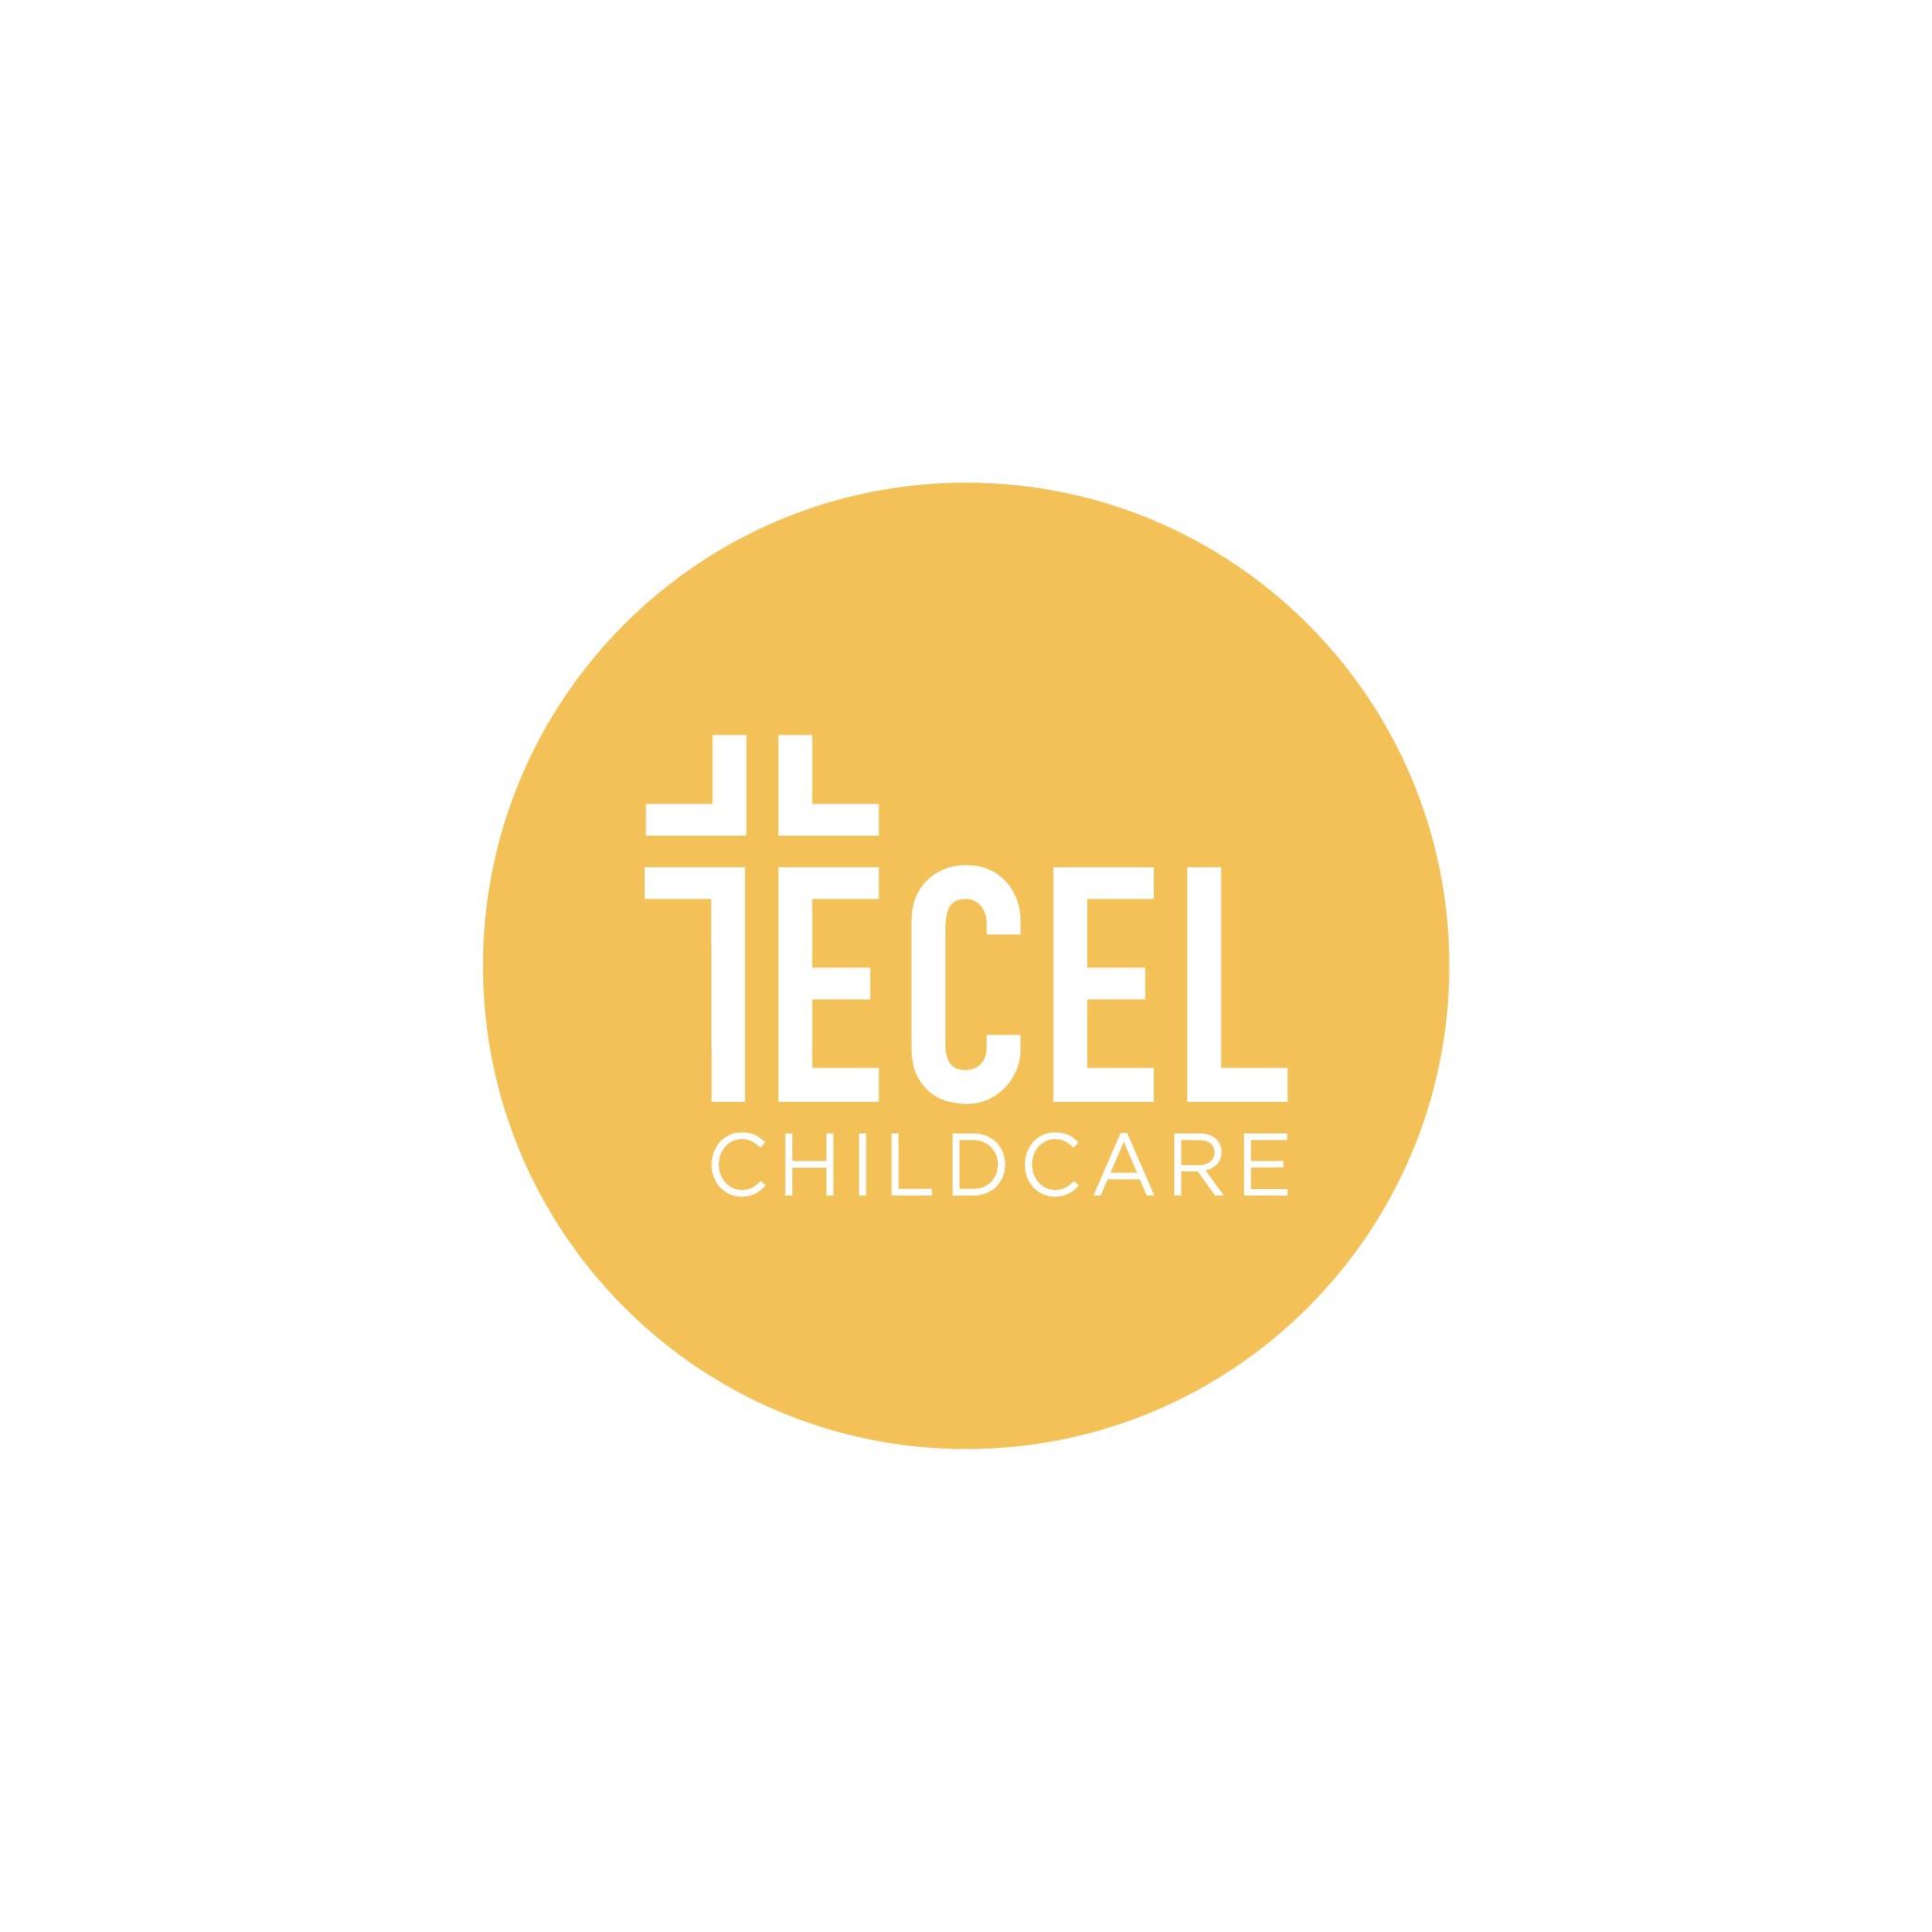 Christian Childcare logo